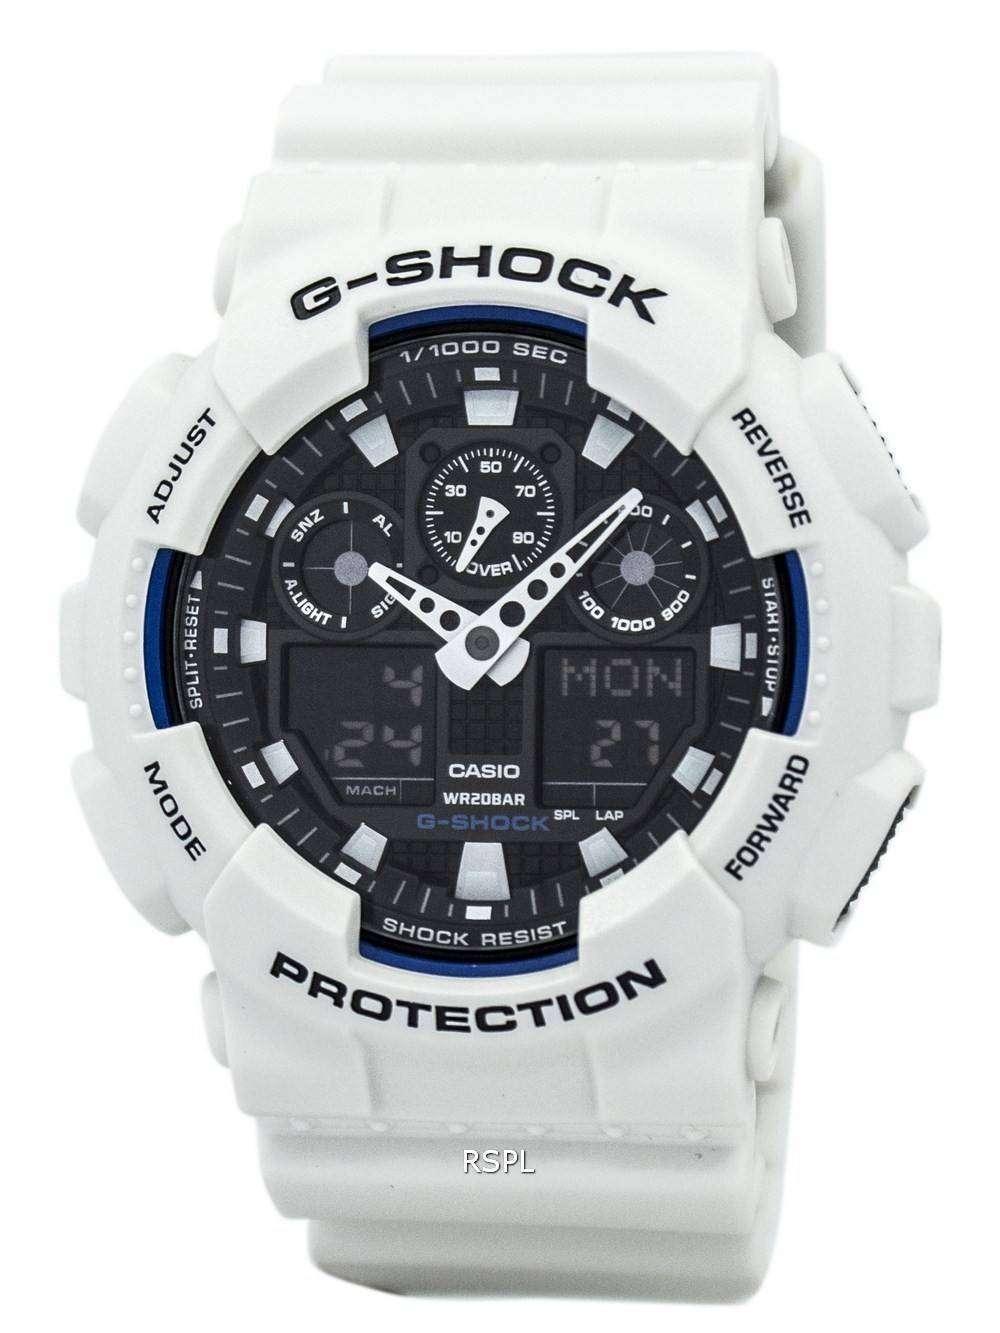 60d2de0ddbdb Casio G Shock World Time White Analog Digital Ga 100b 7a Mens Watch Casio G  Shock